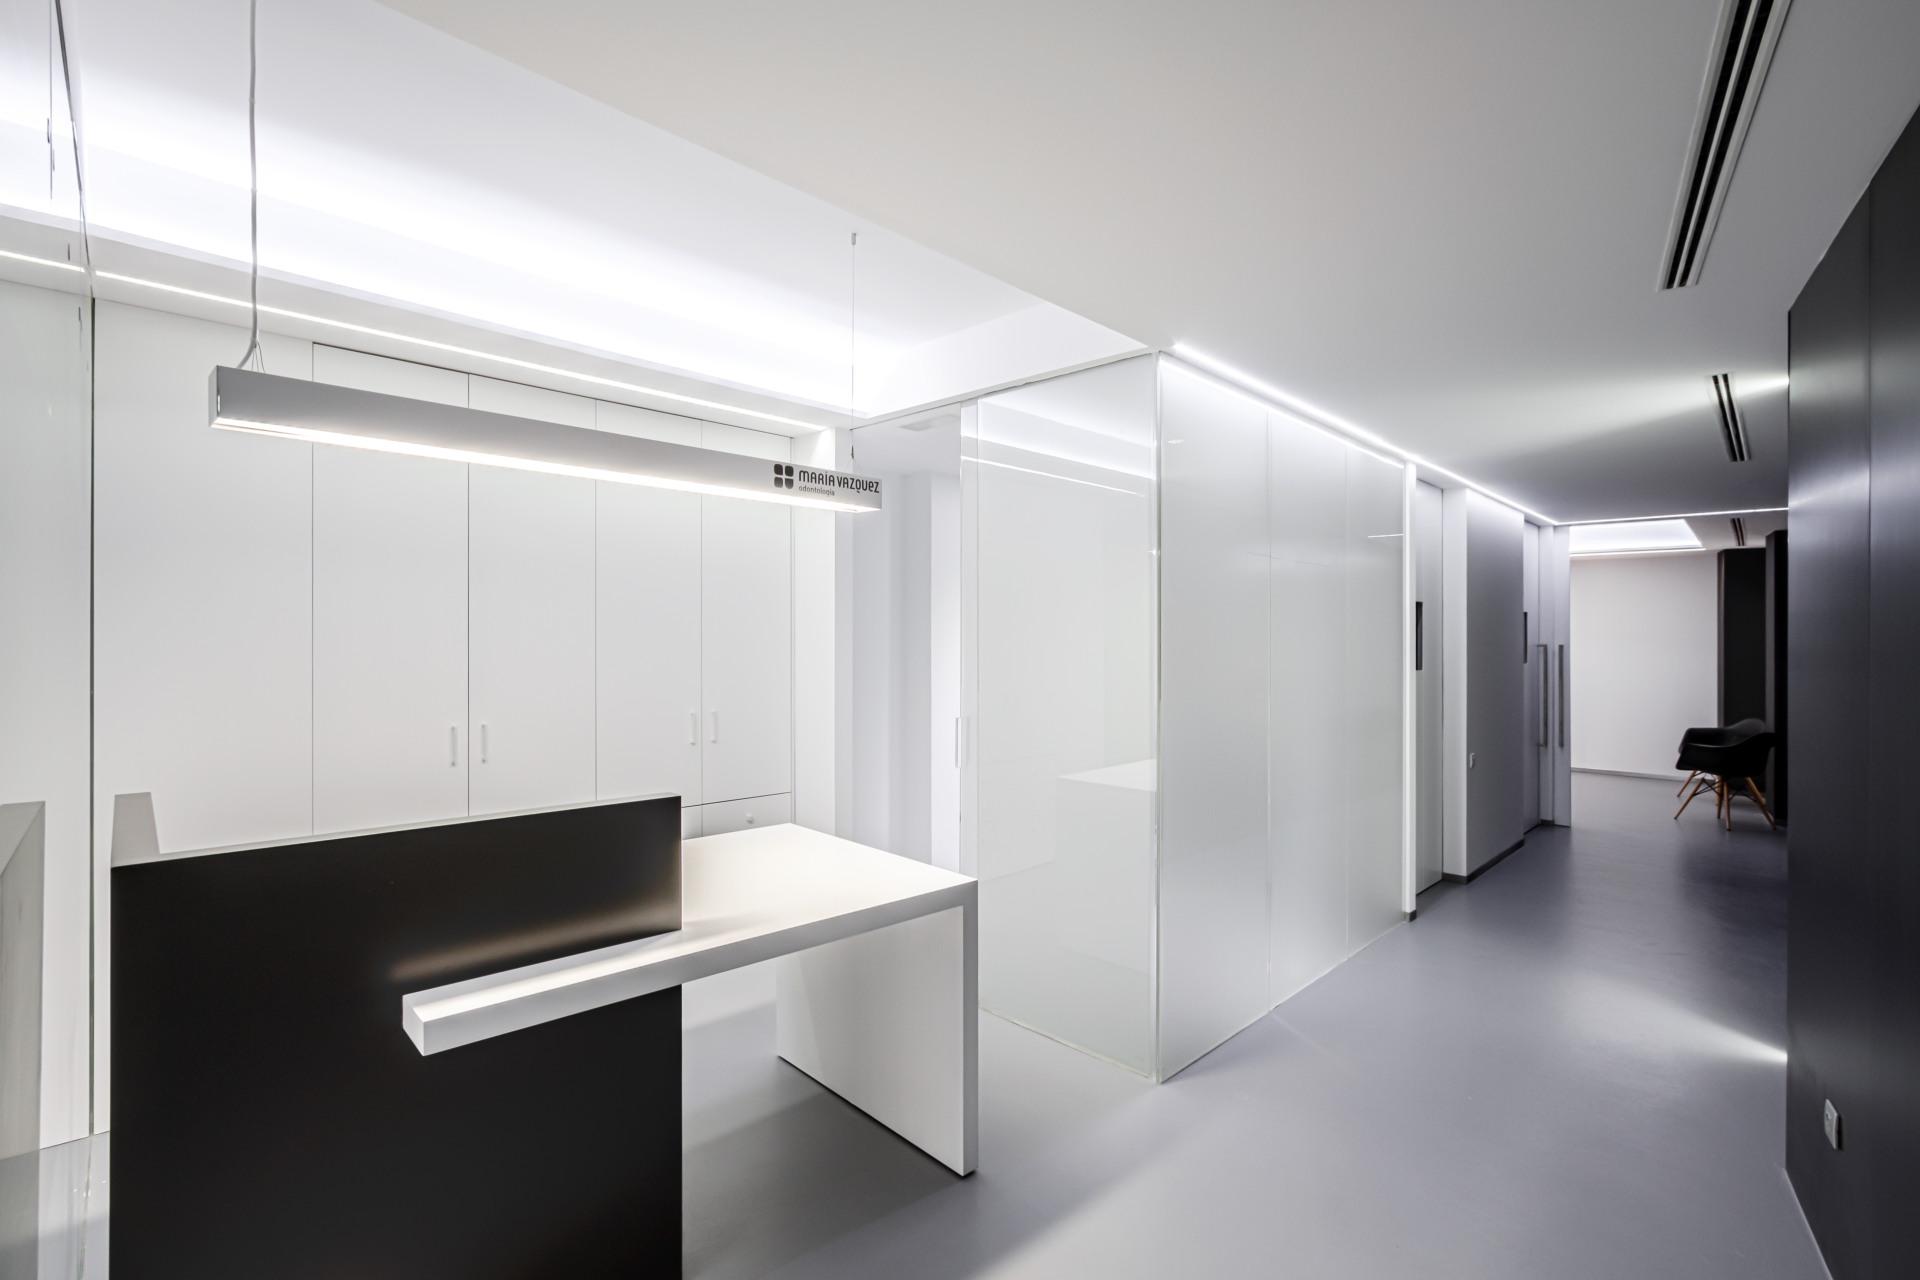 fotografia-arquitectura-valencia-german-cabo-hernandez-clinica (2)